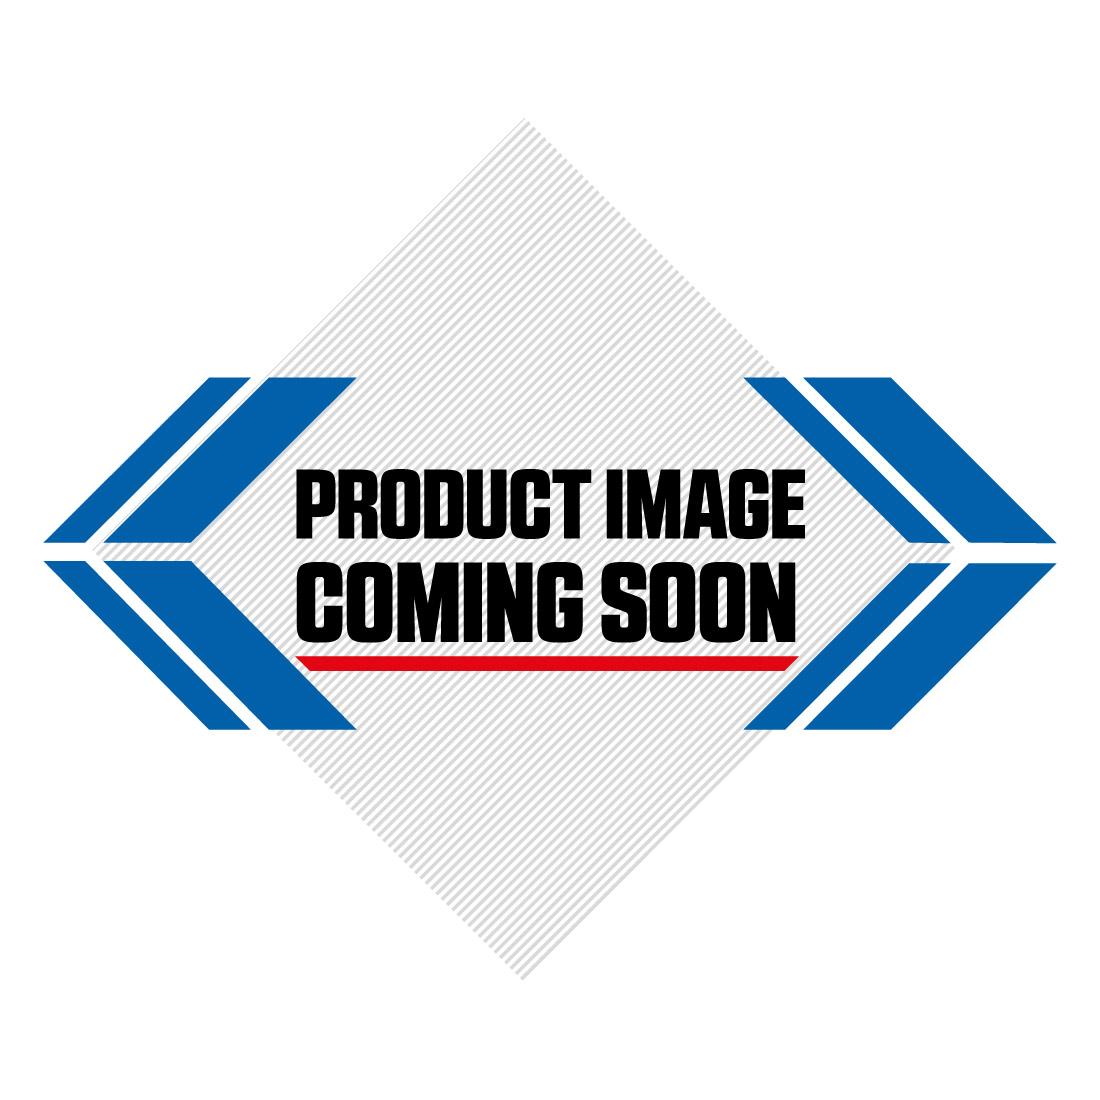 DJI Mavic Pro Fly More Combo 4K Quadcopter Drone Image-3>